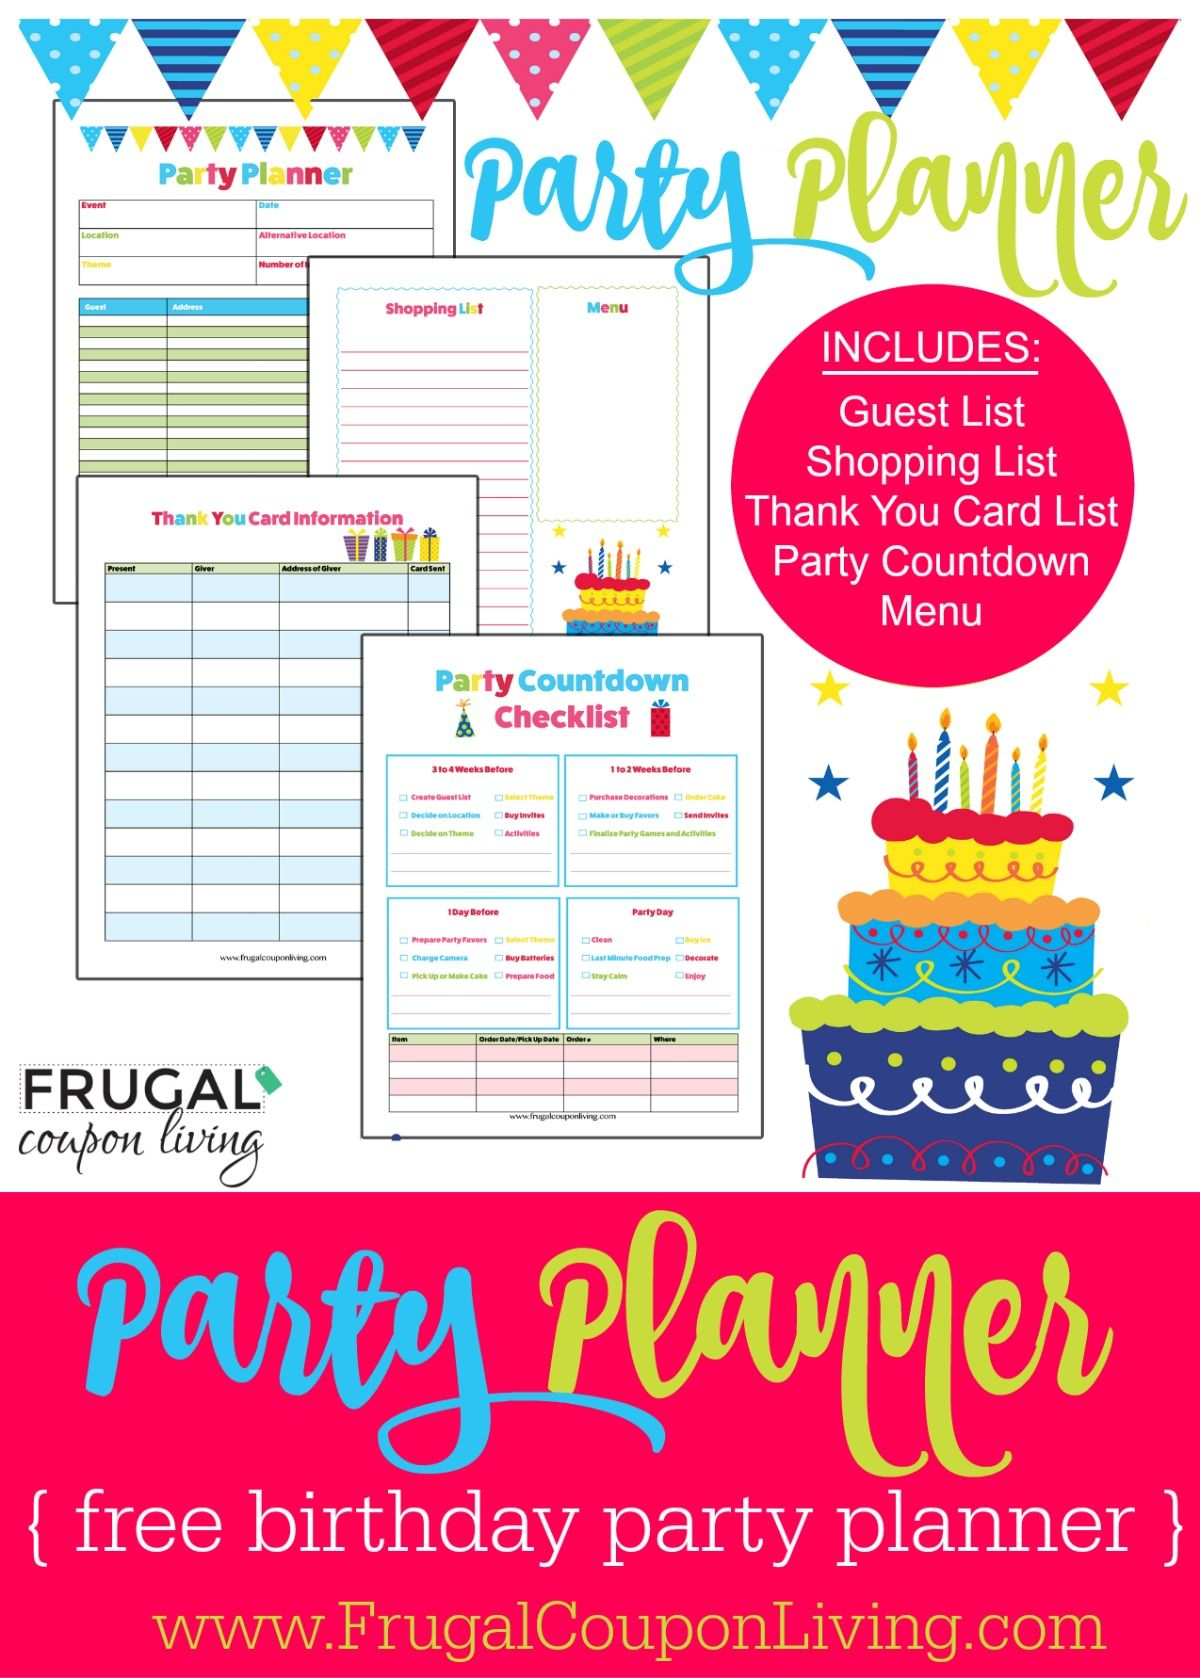 FREE Birthday Party Planner | Pinterest | Free birthday, Party ...